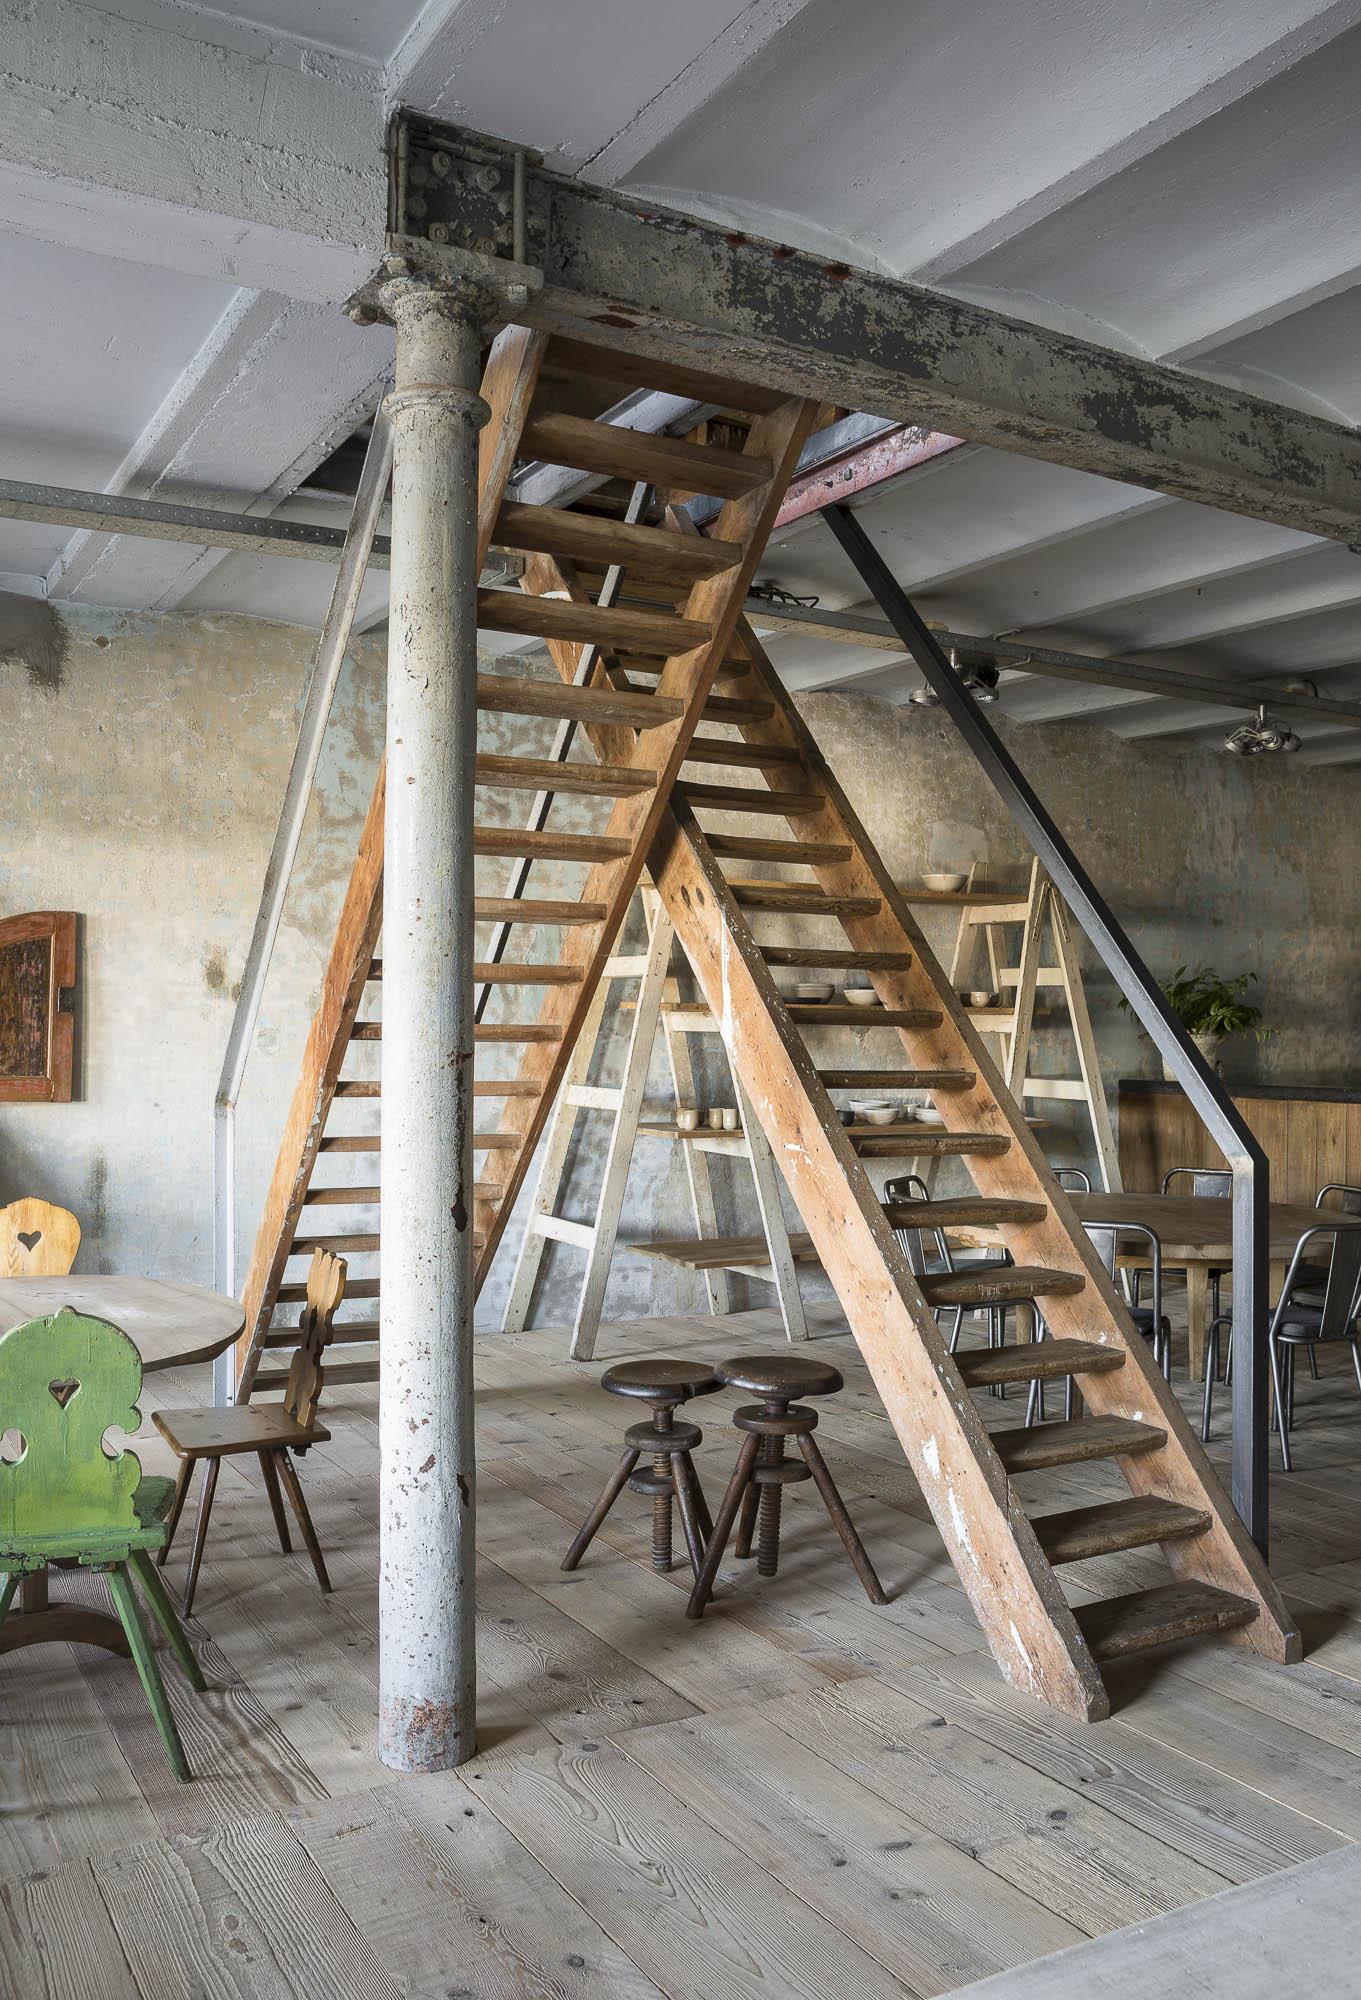 art-dealer-axel-vervoordt-belgian-estate-by-frederik-vercruysse-9